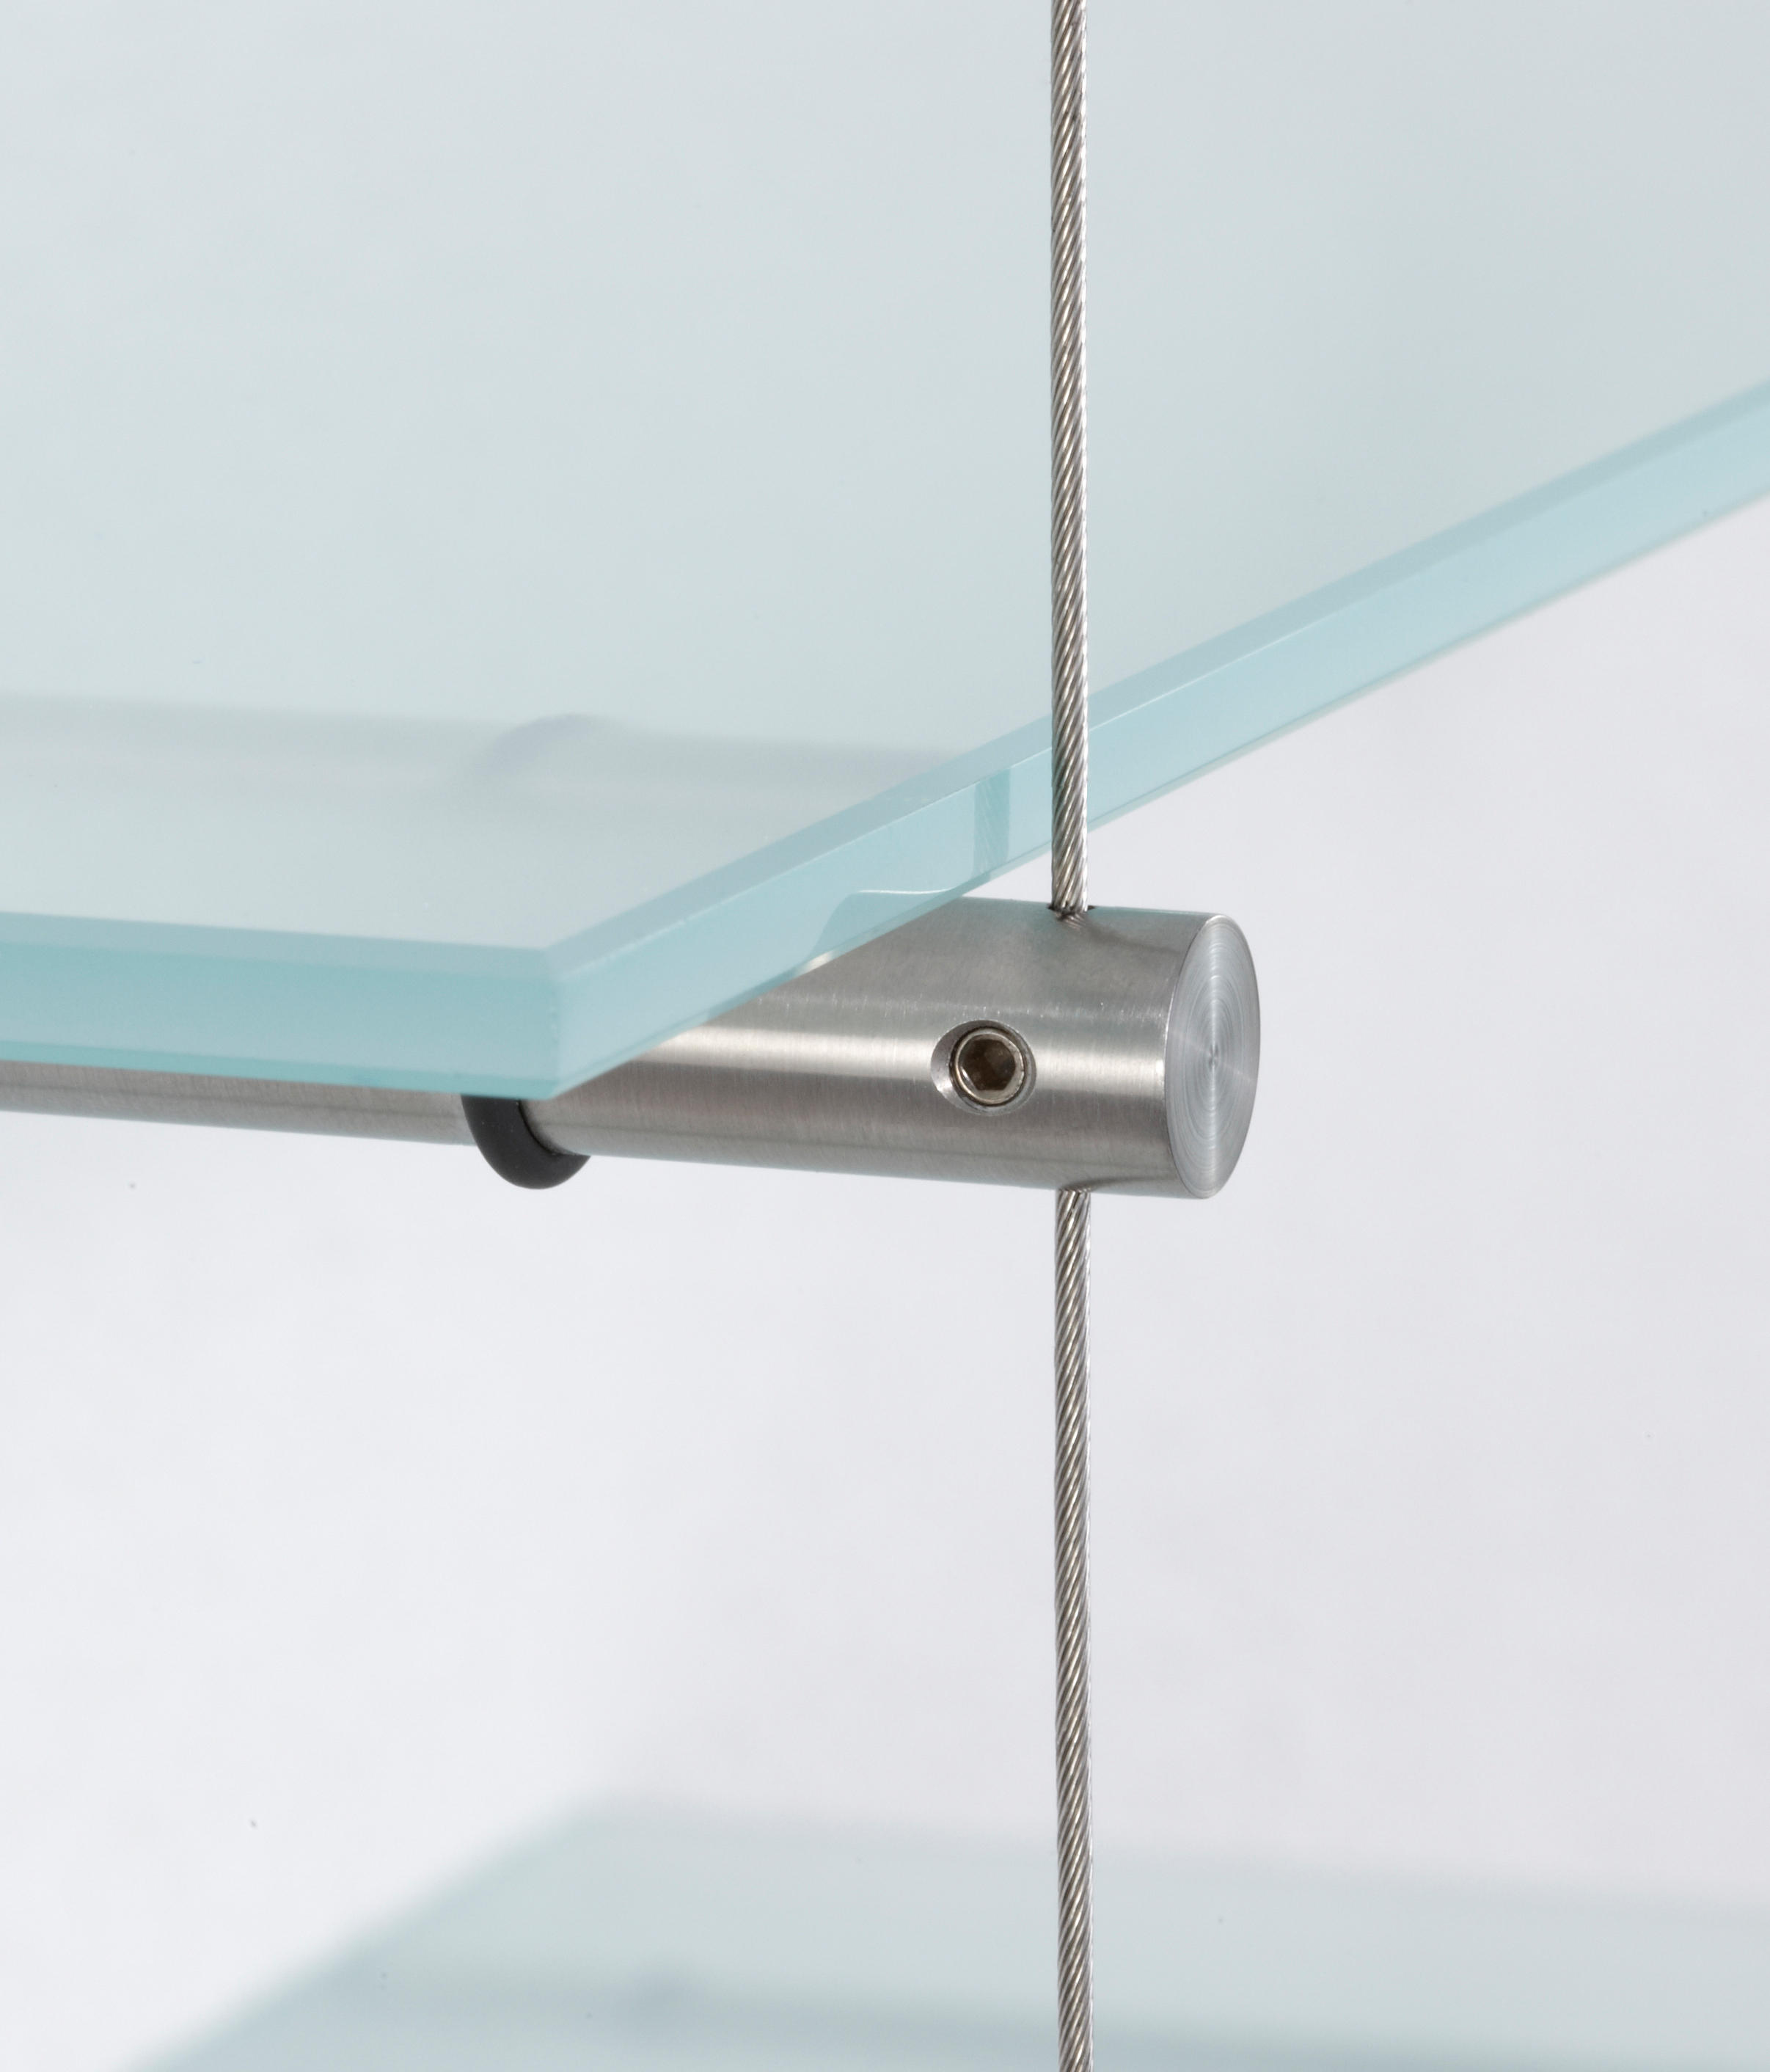 glasregal rst 260 seilsysteme von phos design architonic. Black Bedroom Furniture Sets. Home Design Ideas